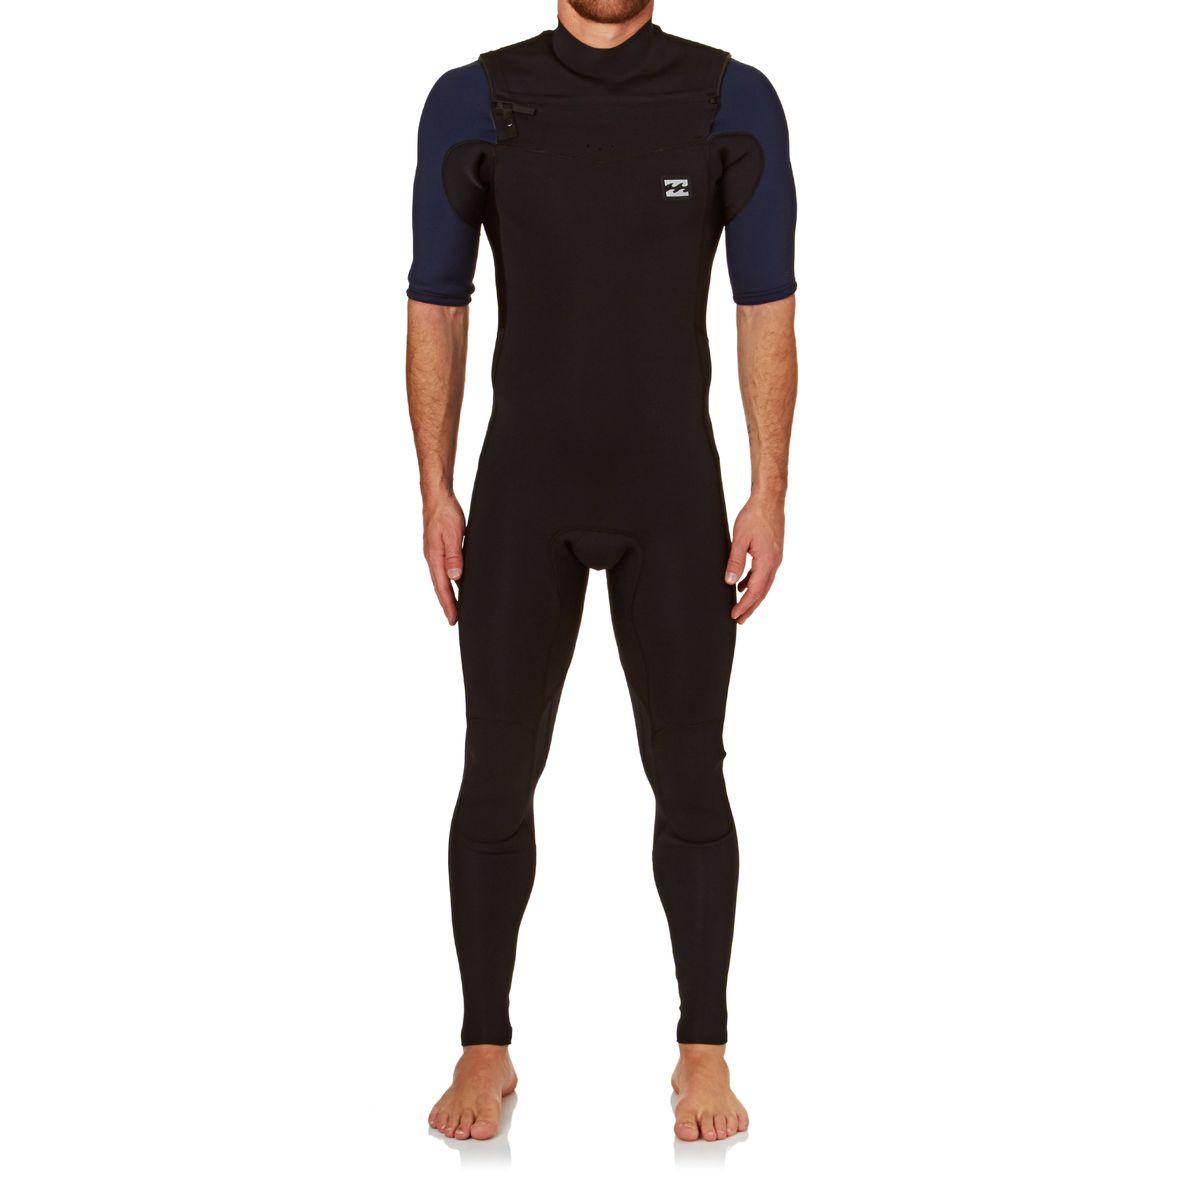 Billabong Revolution Tri Bong 2mm 2017 Chest Zip Short Sleeve Wetsuit - Black